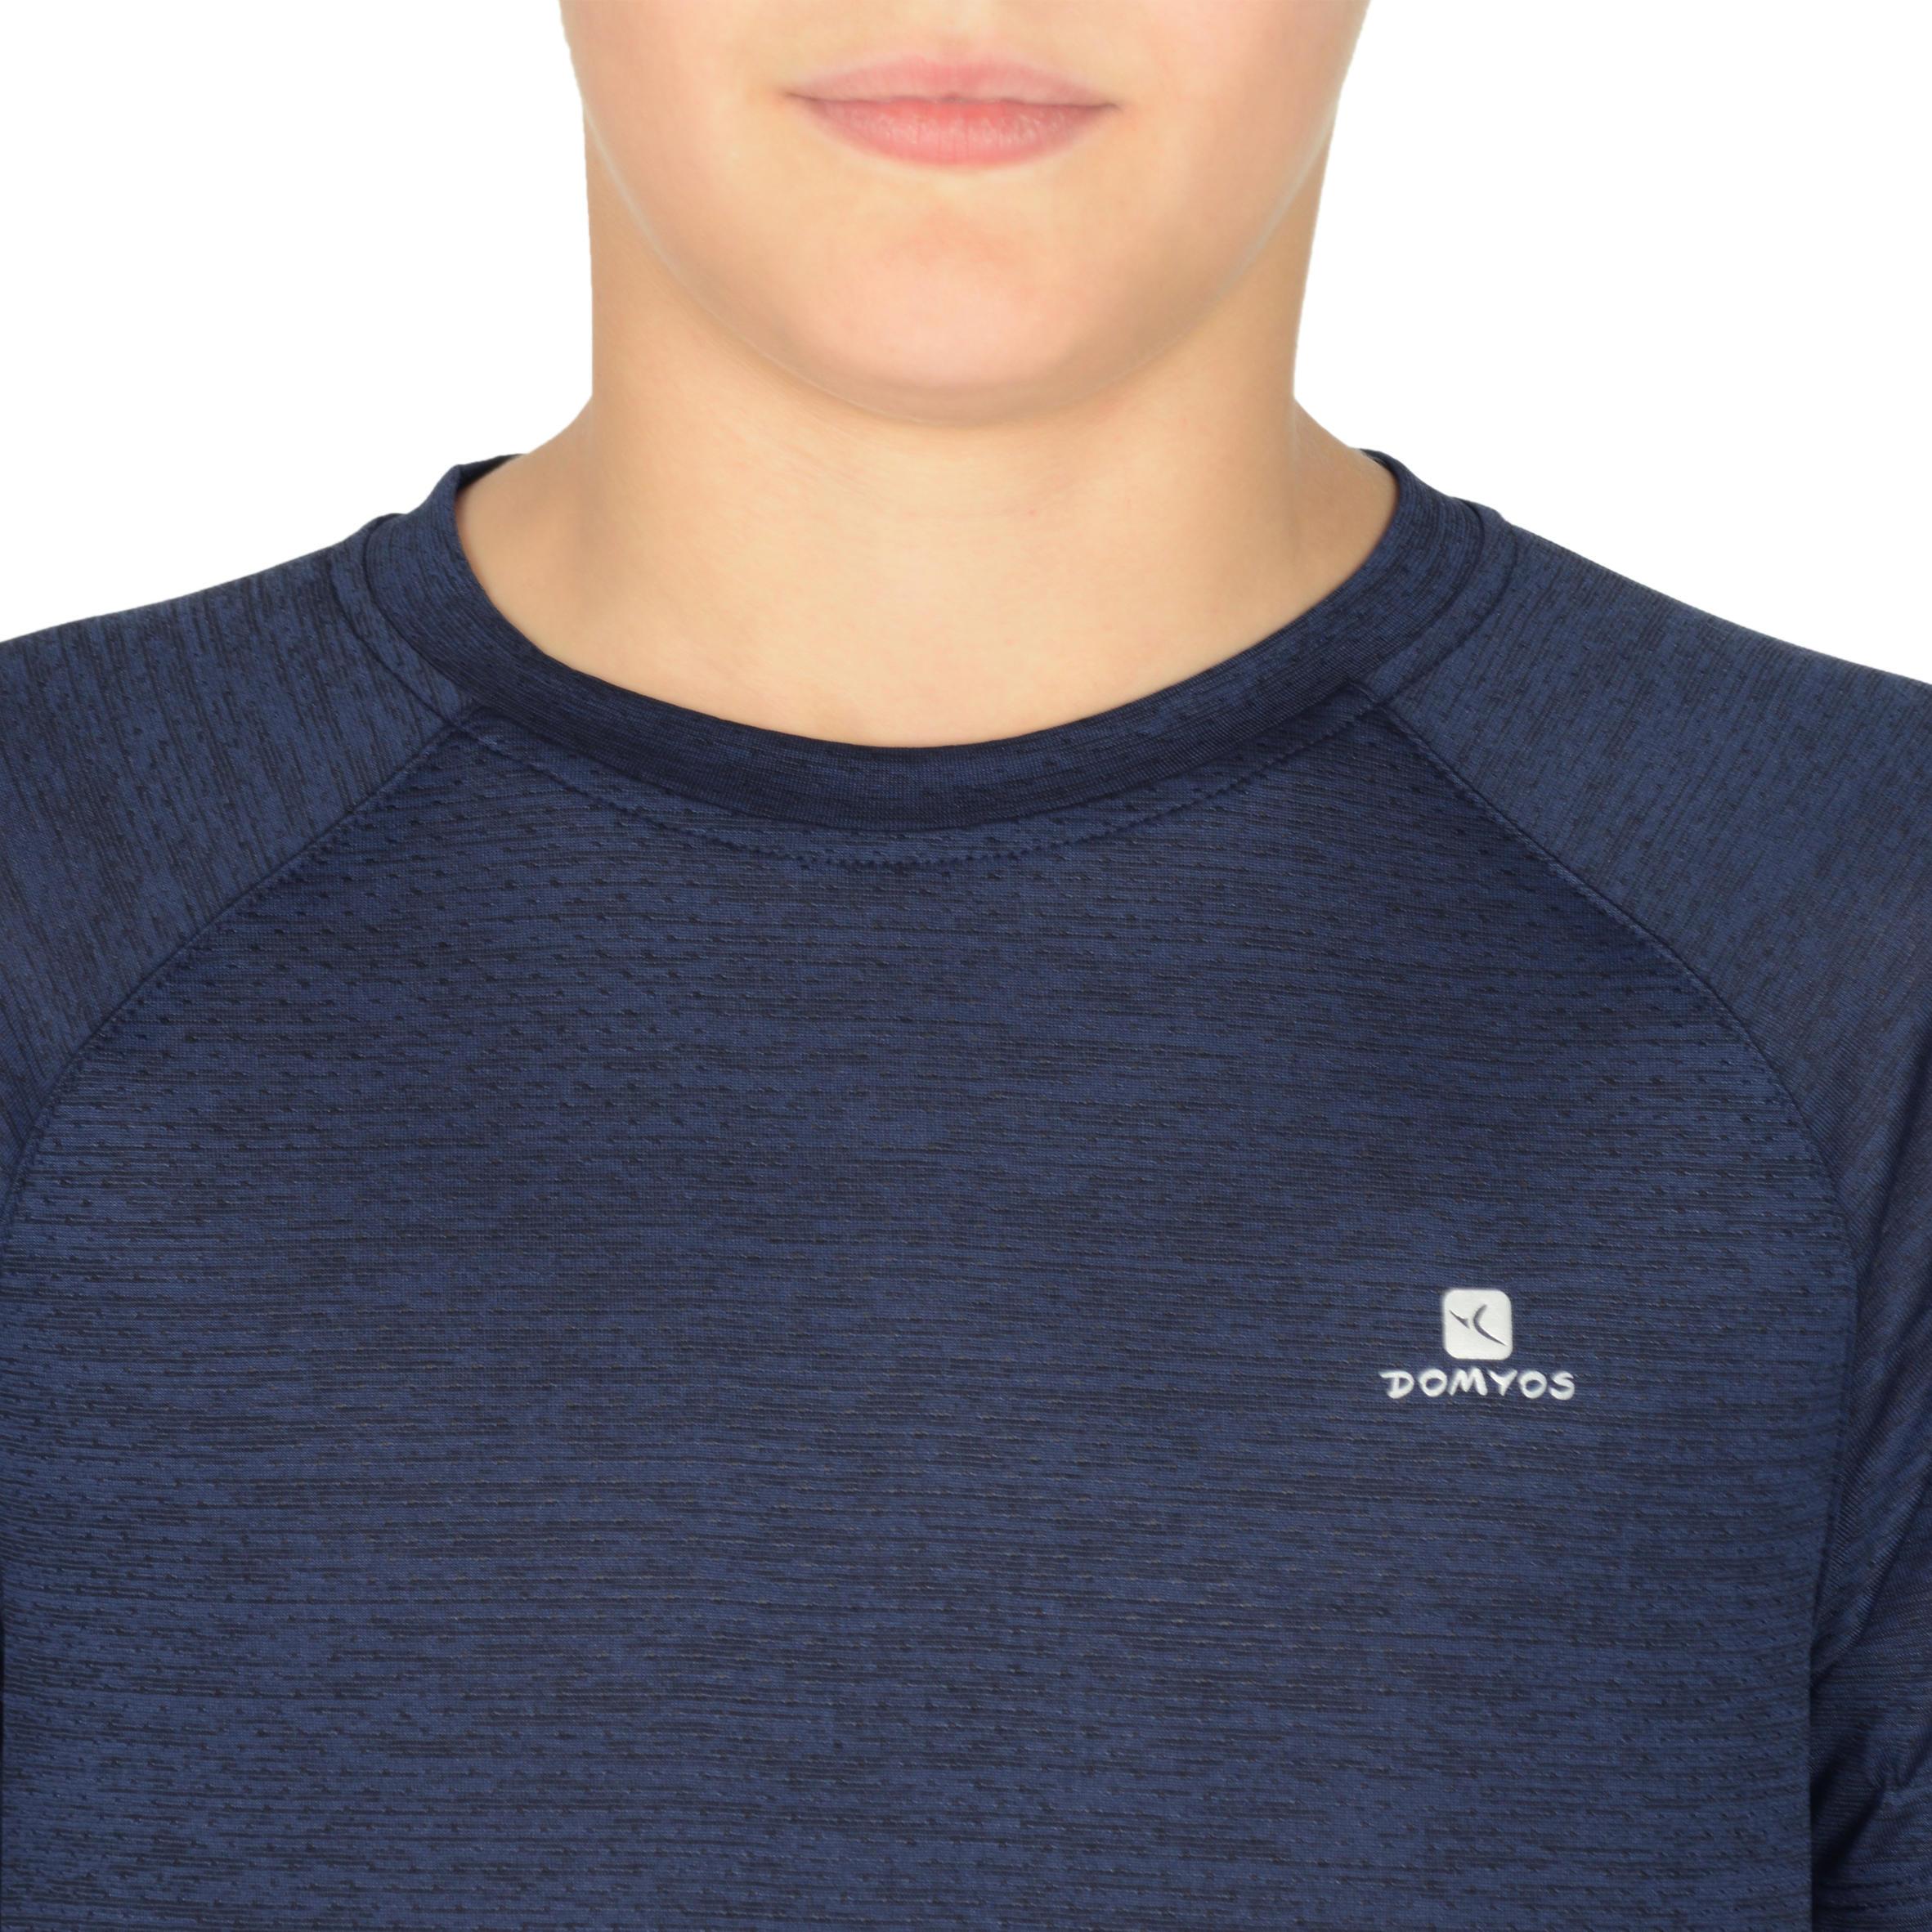 S500 Boys' Short-Sleeved Gym T-Shirt - Navy